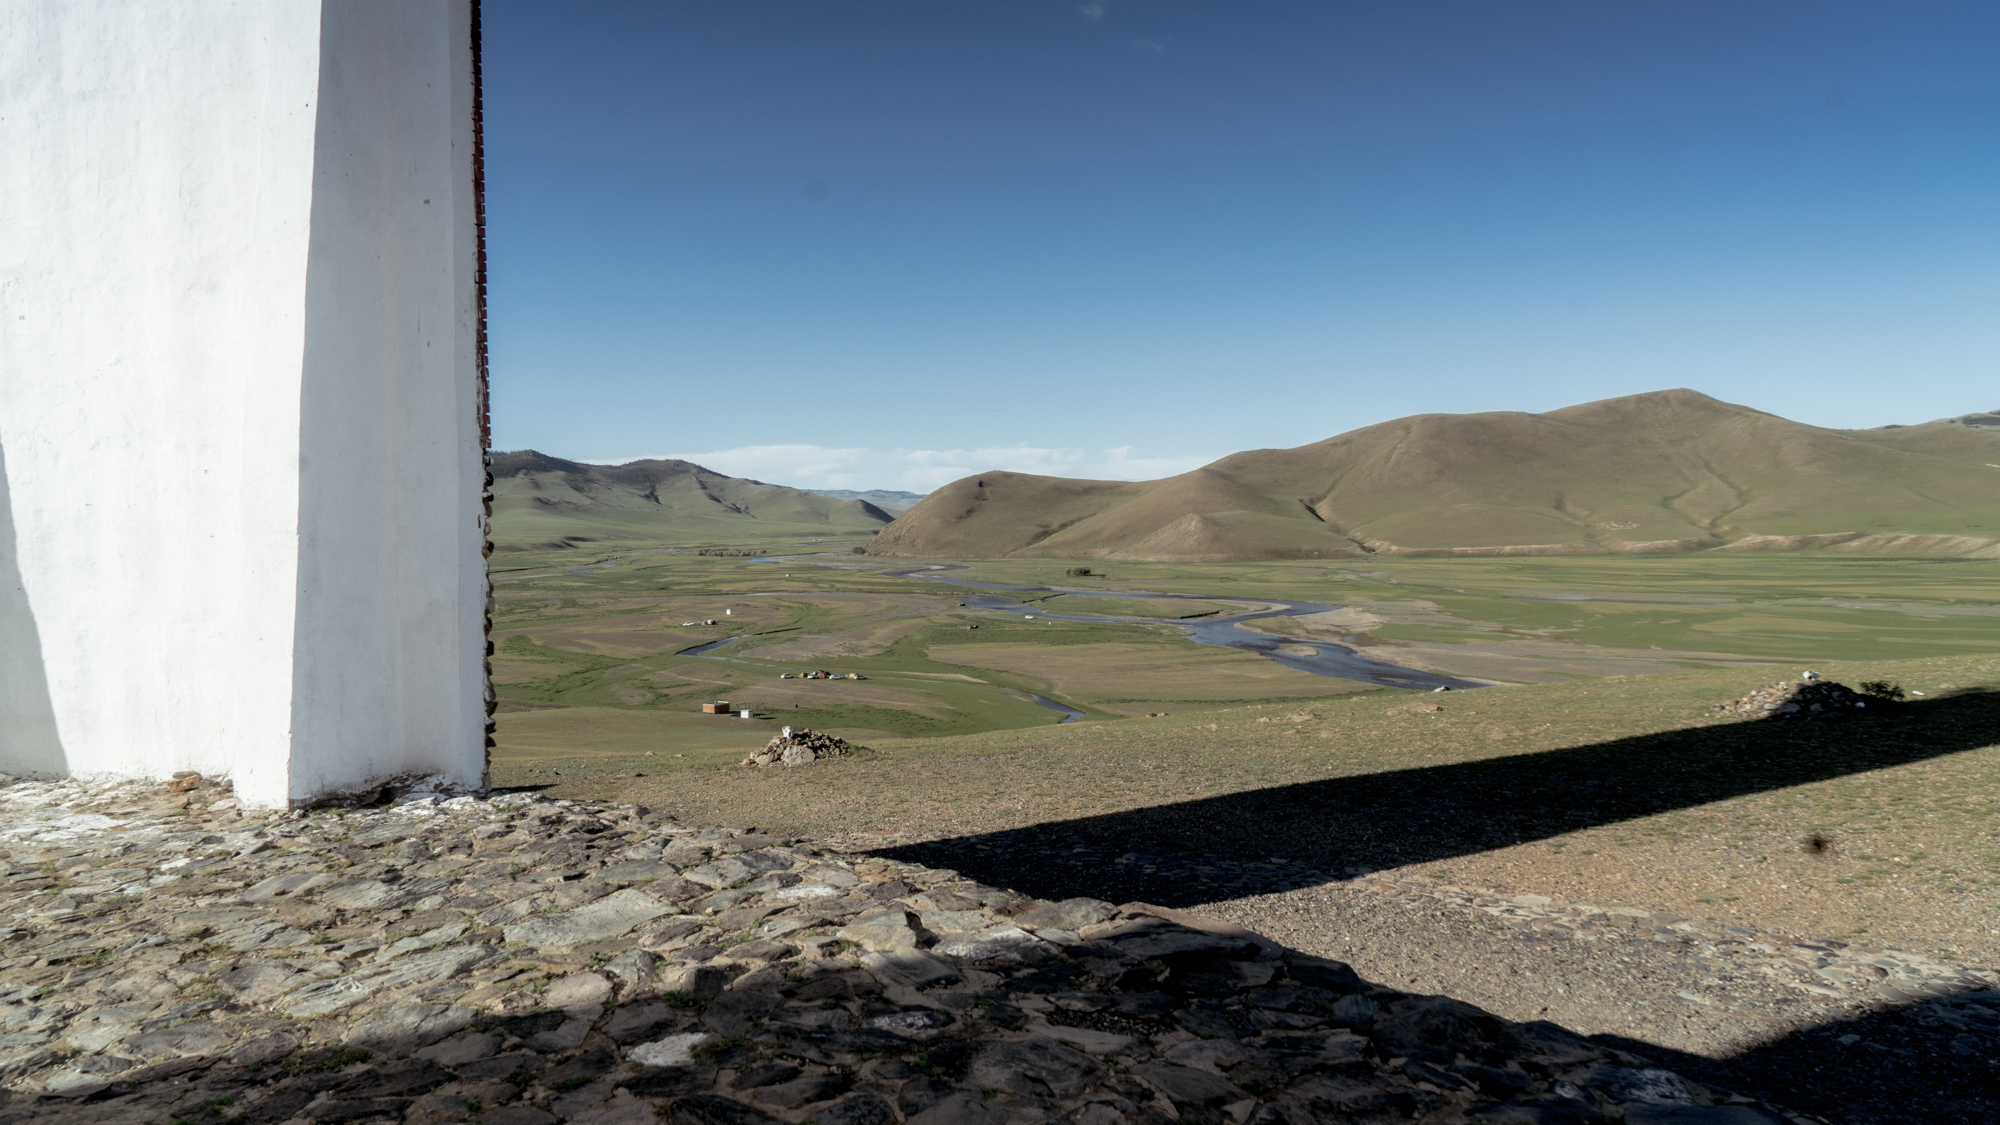 Mongolia 2017 Harry Fisch 2000sin título2017-05650.jpg